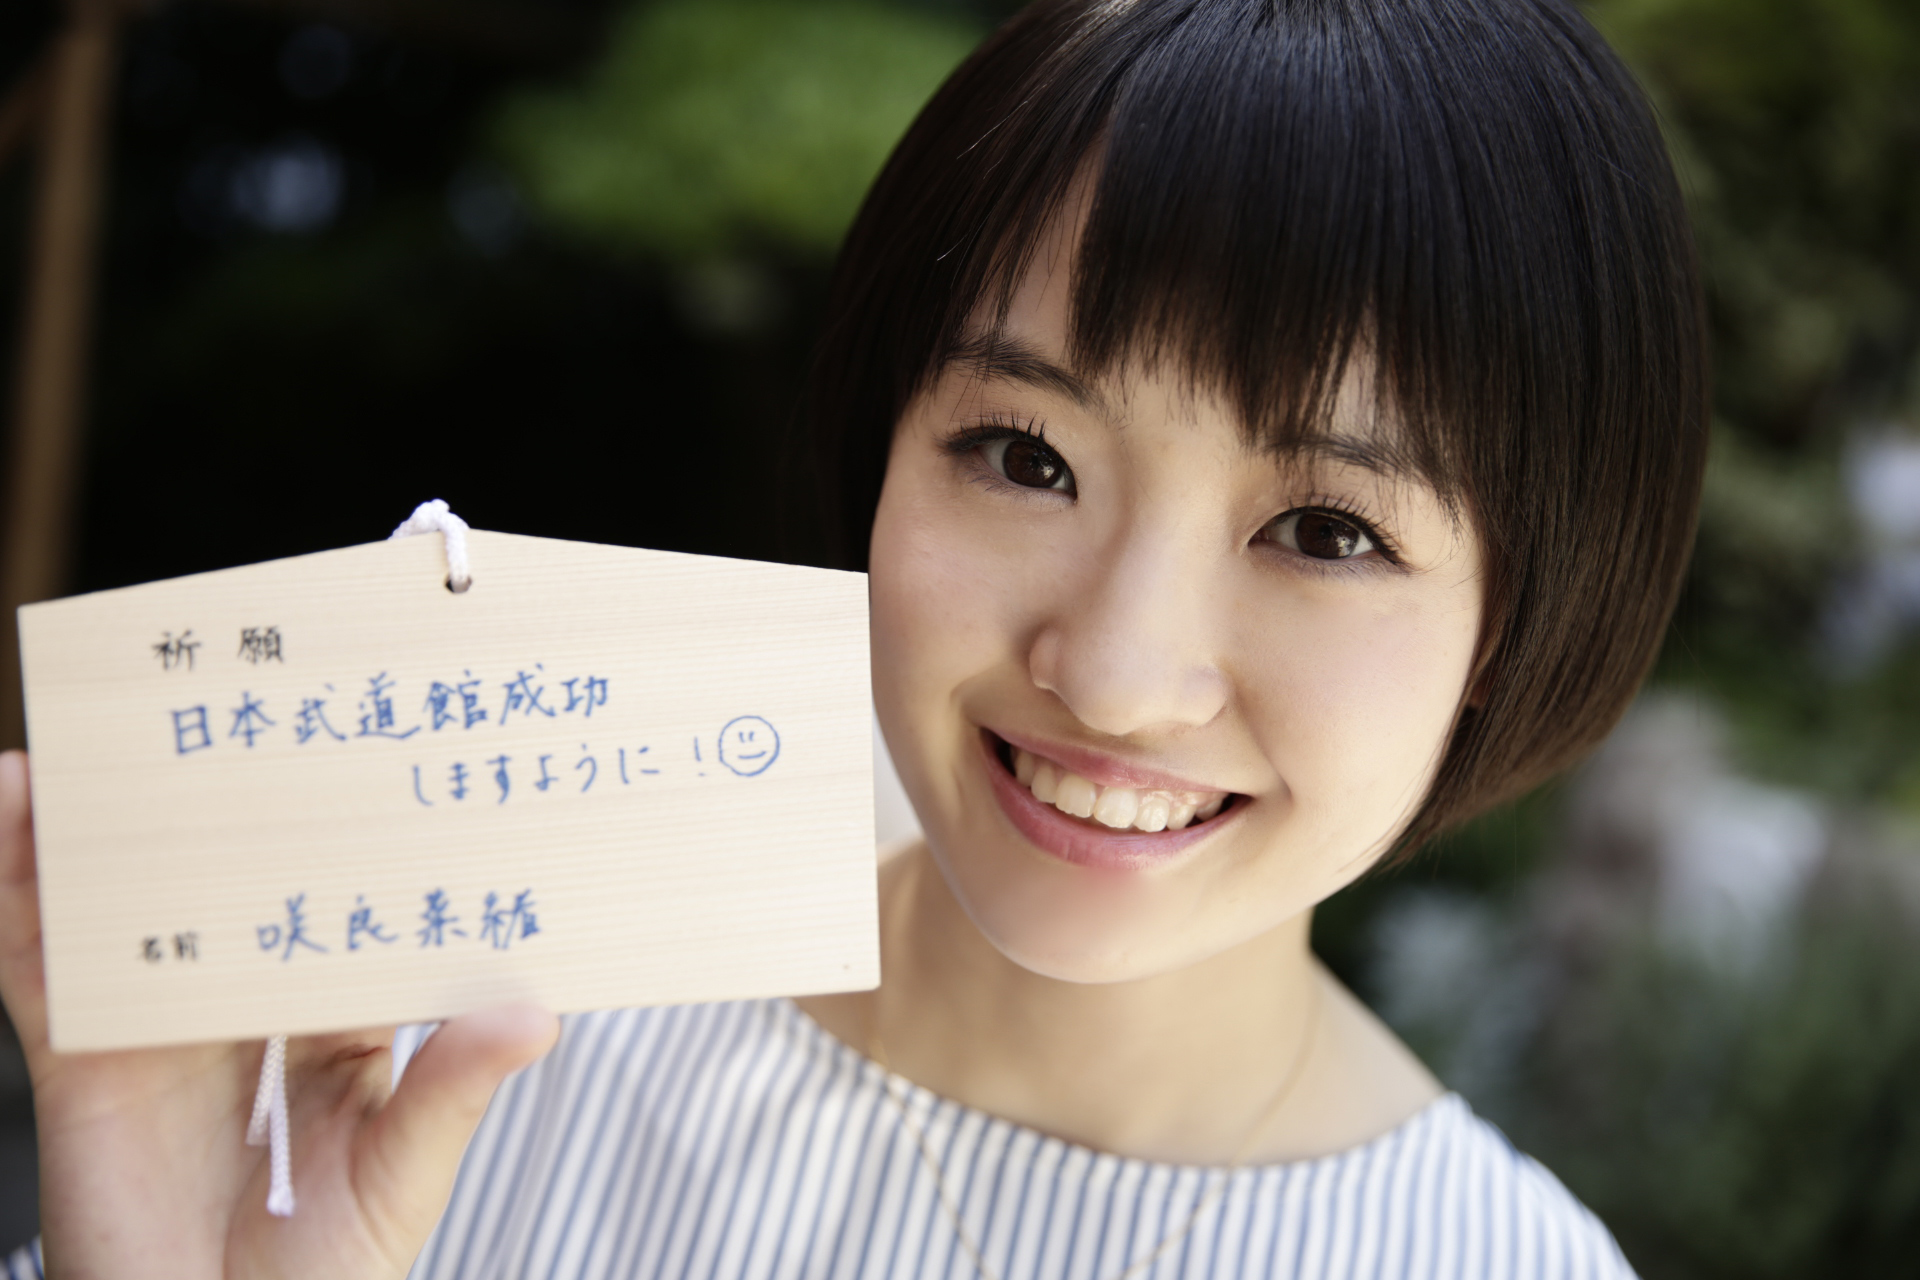 20160804_sakuranao1_offshot_toukou